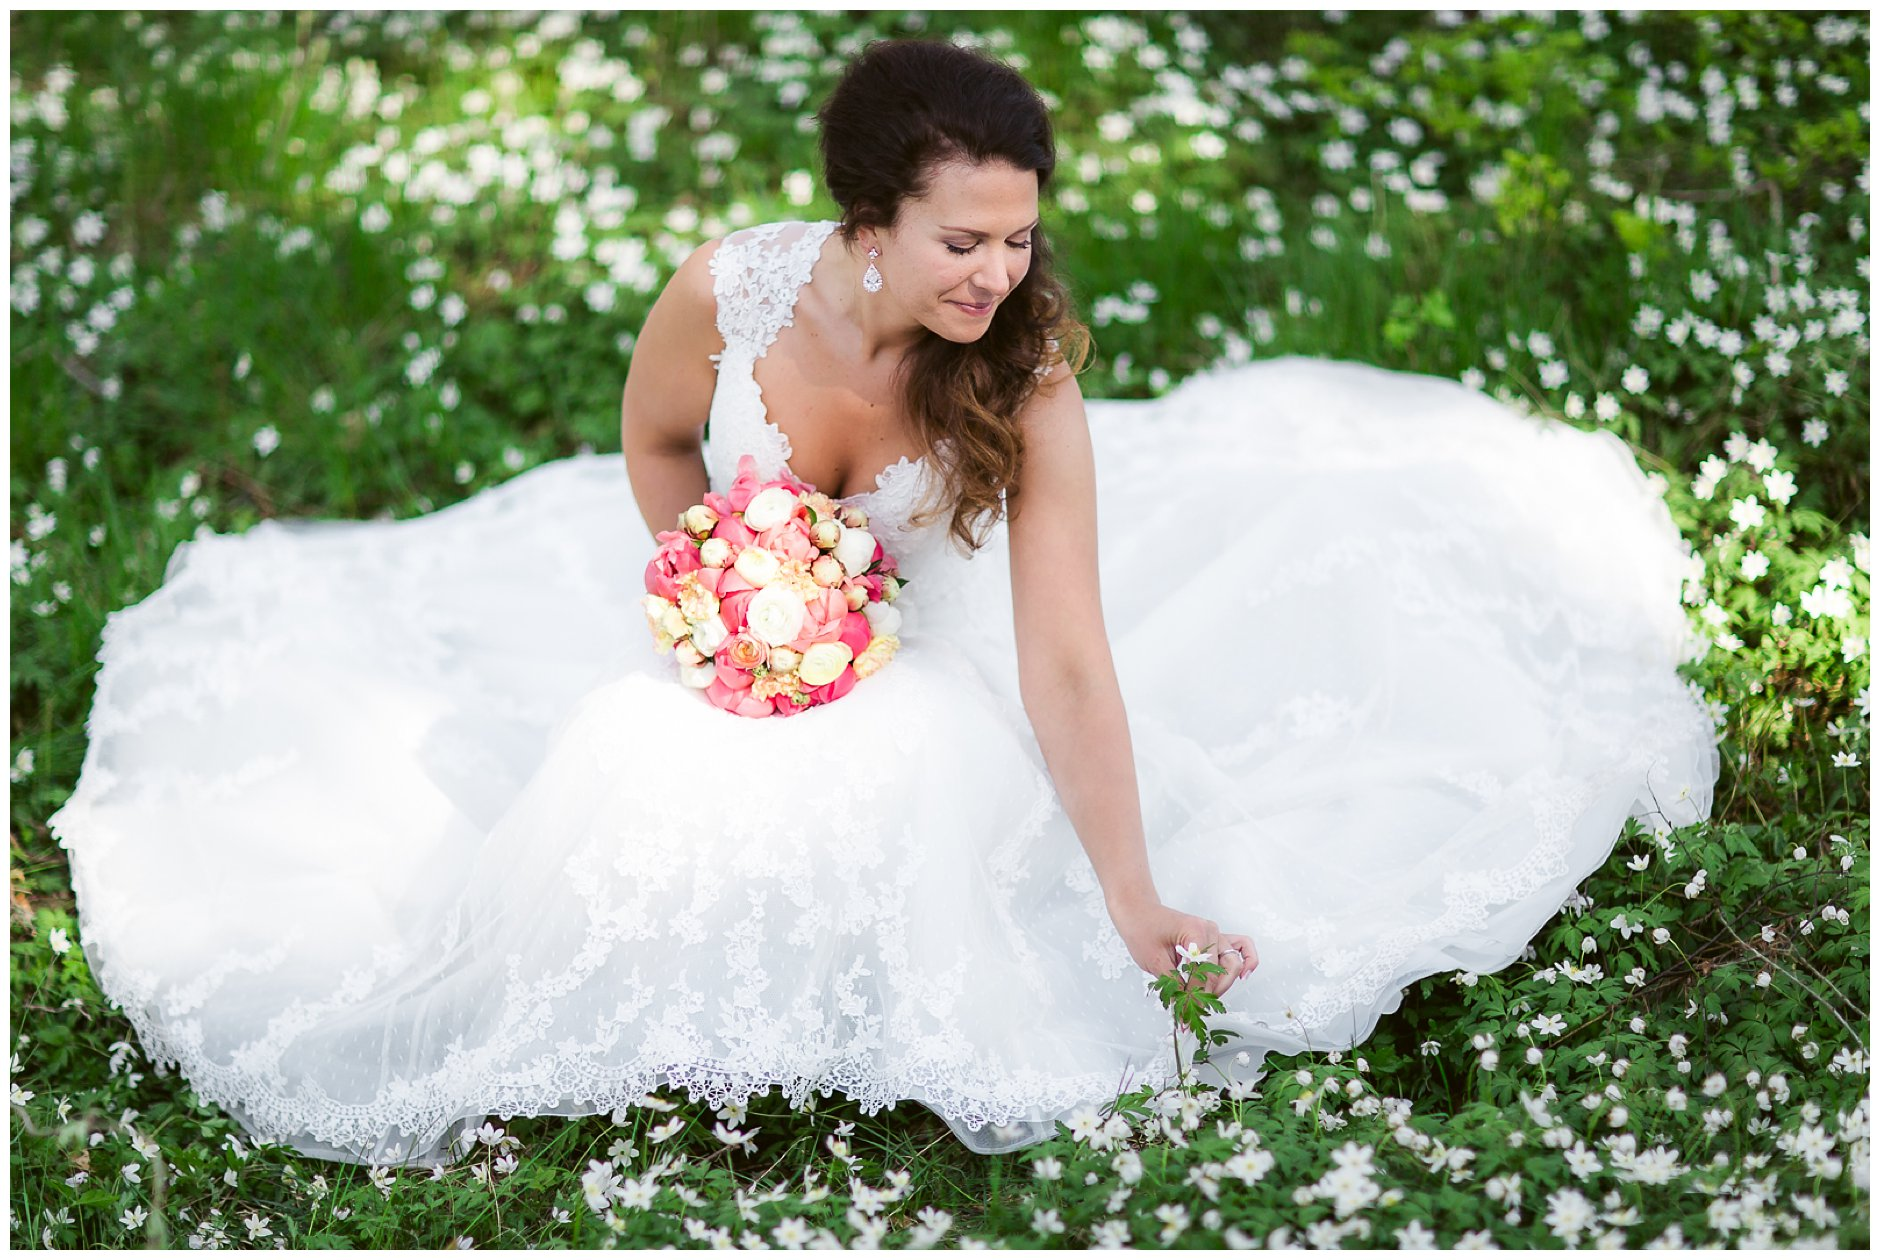 Brud i blomstereng